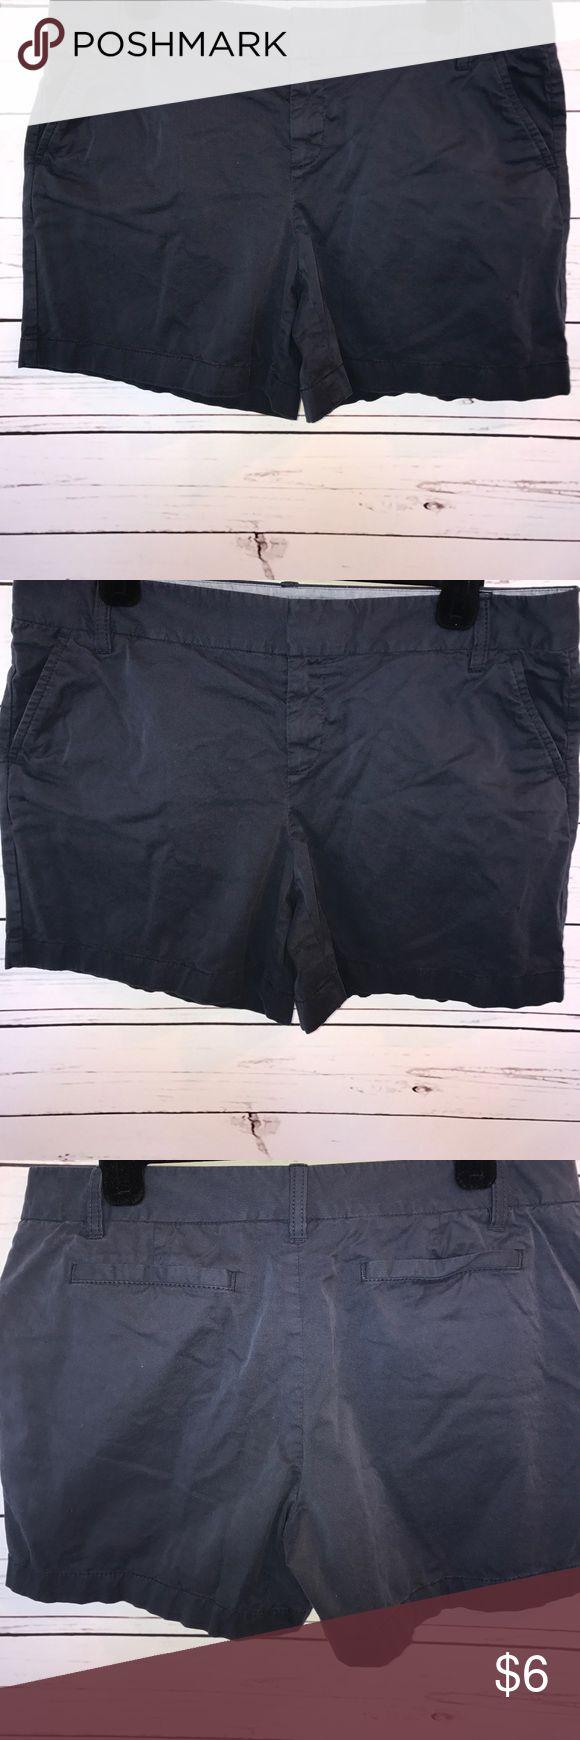 "Caslon Navy blue shorts size 10 Navy blue basic short by Caslon Size 10 lower rise waist measures 17"" ❤️😊🐾 Caslon Shorts"